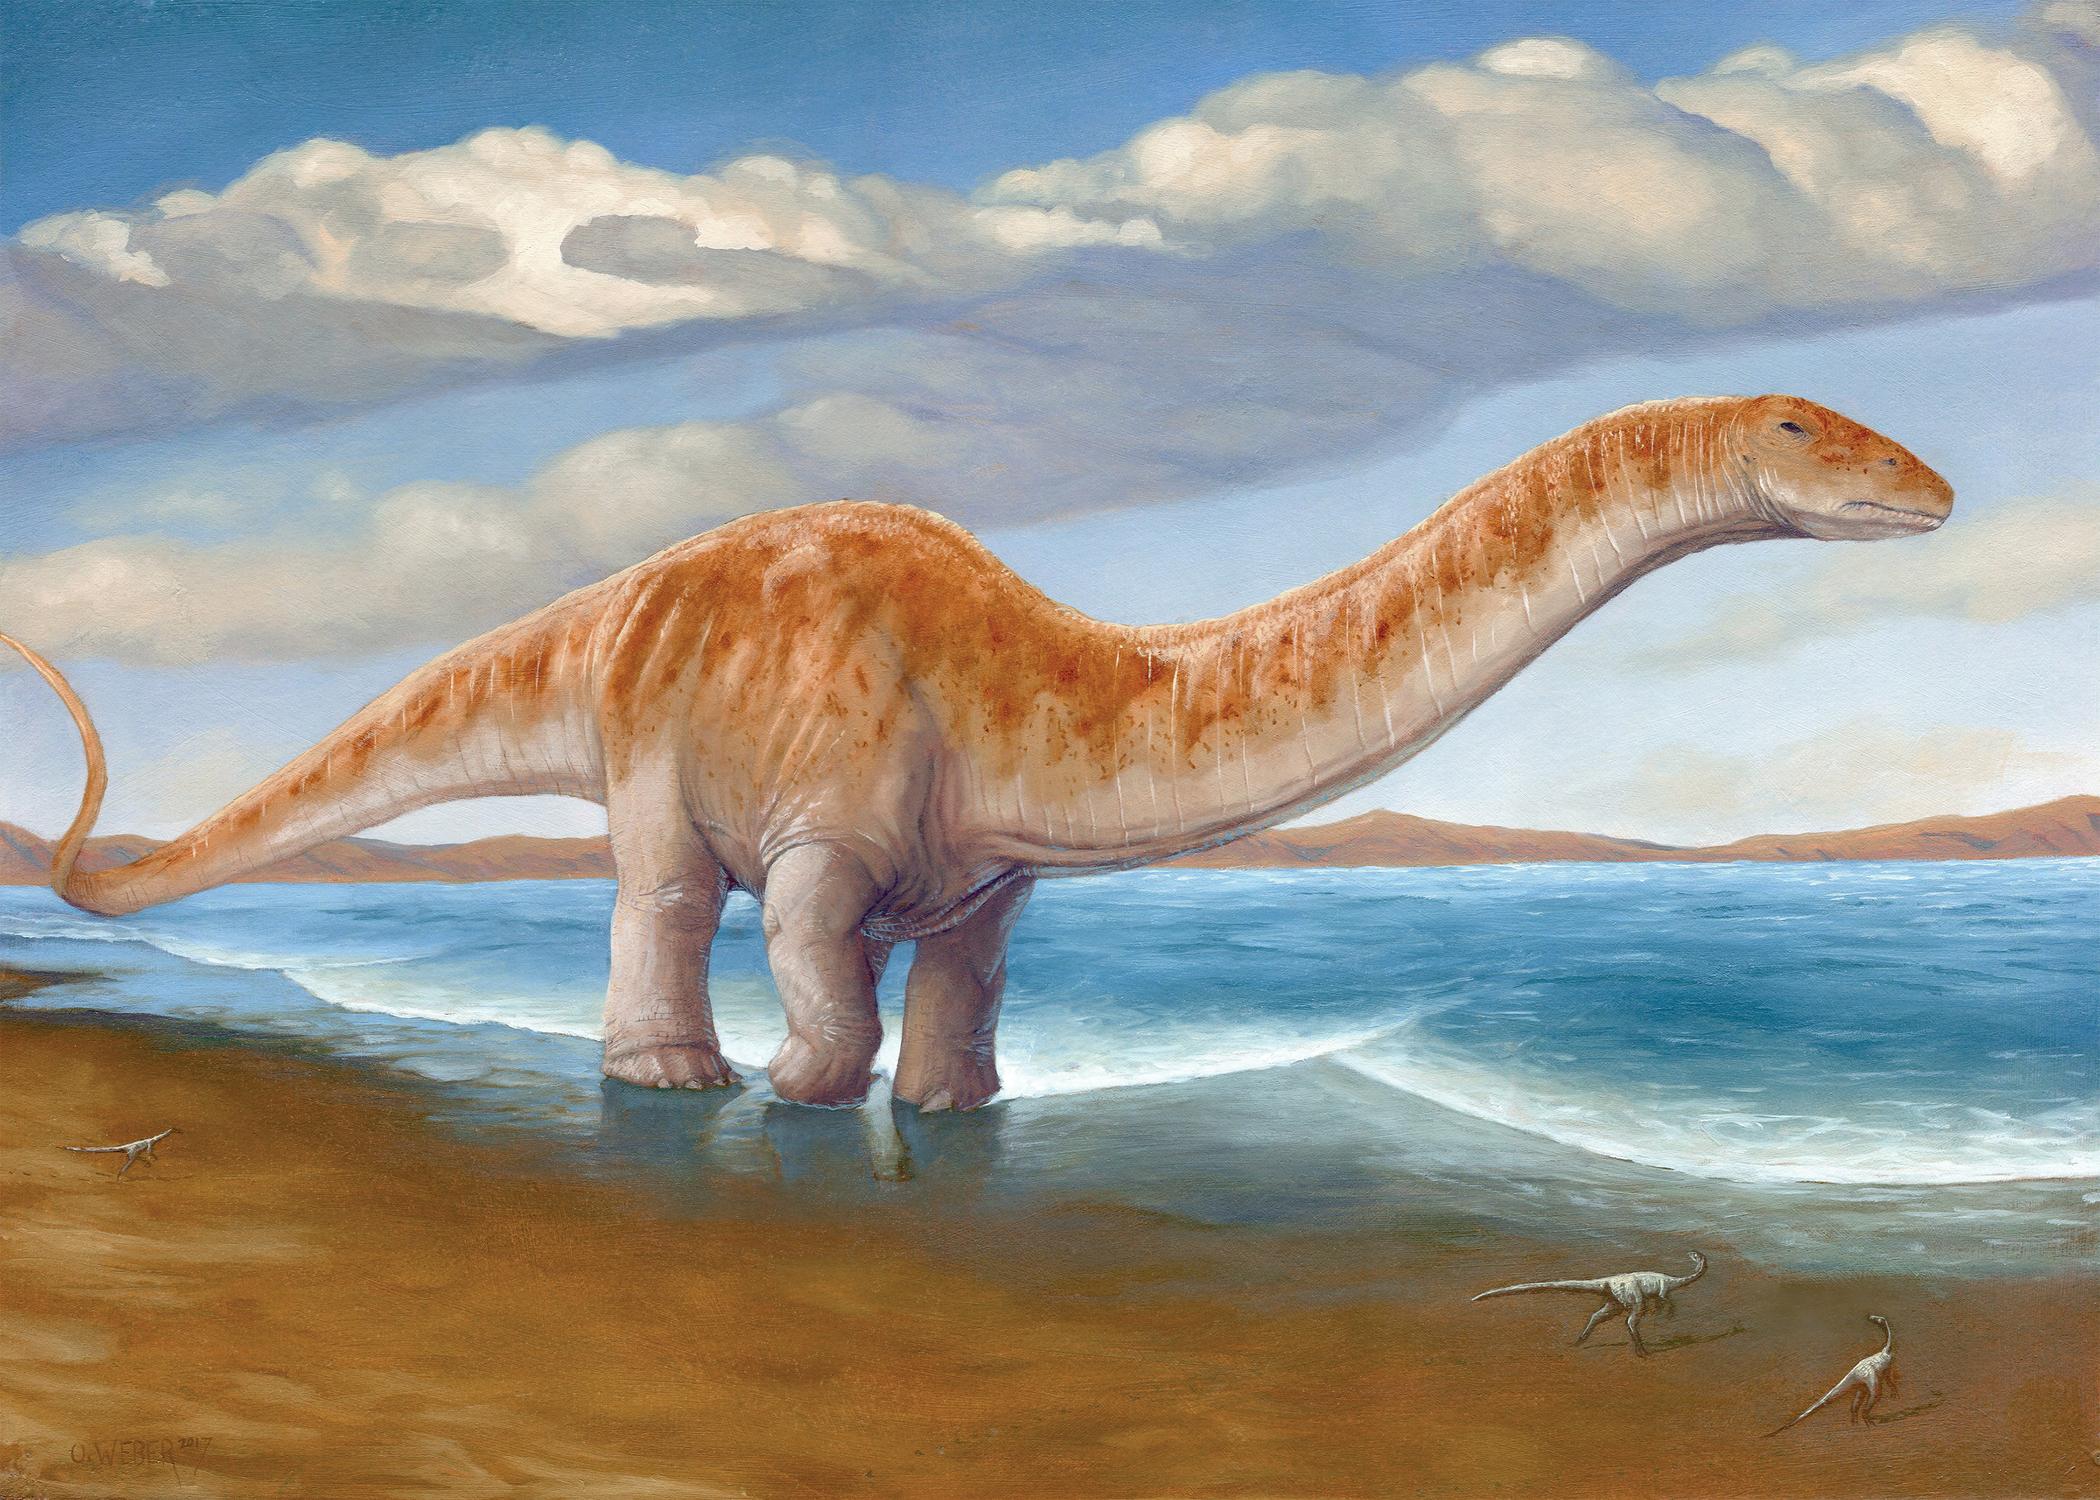 Apatosaurus Artwork by Owen Weber